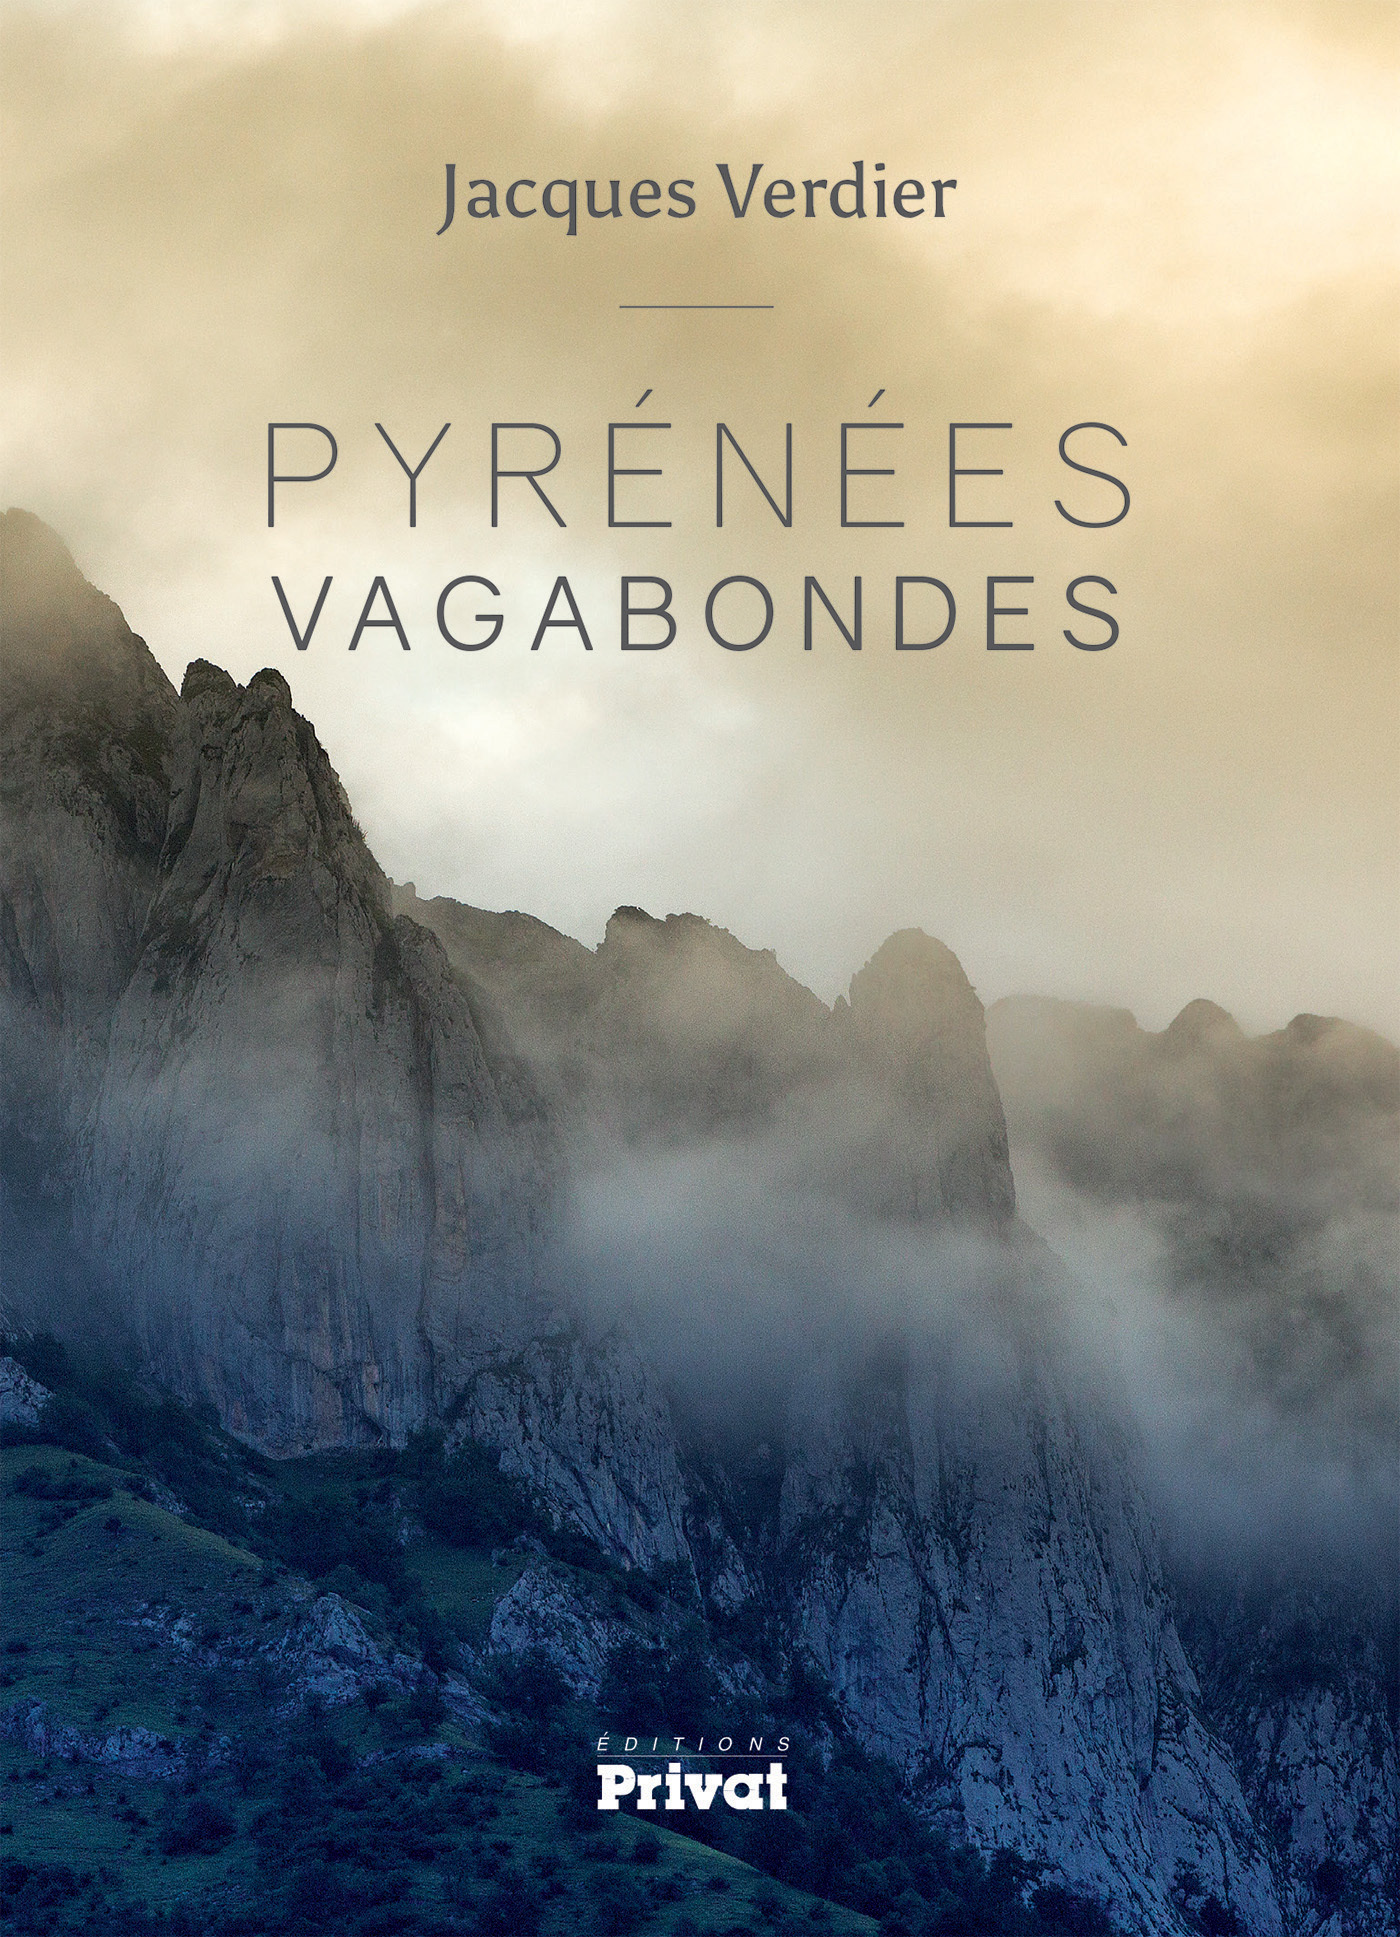 PYRENEES VAGABONDES